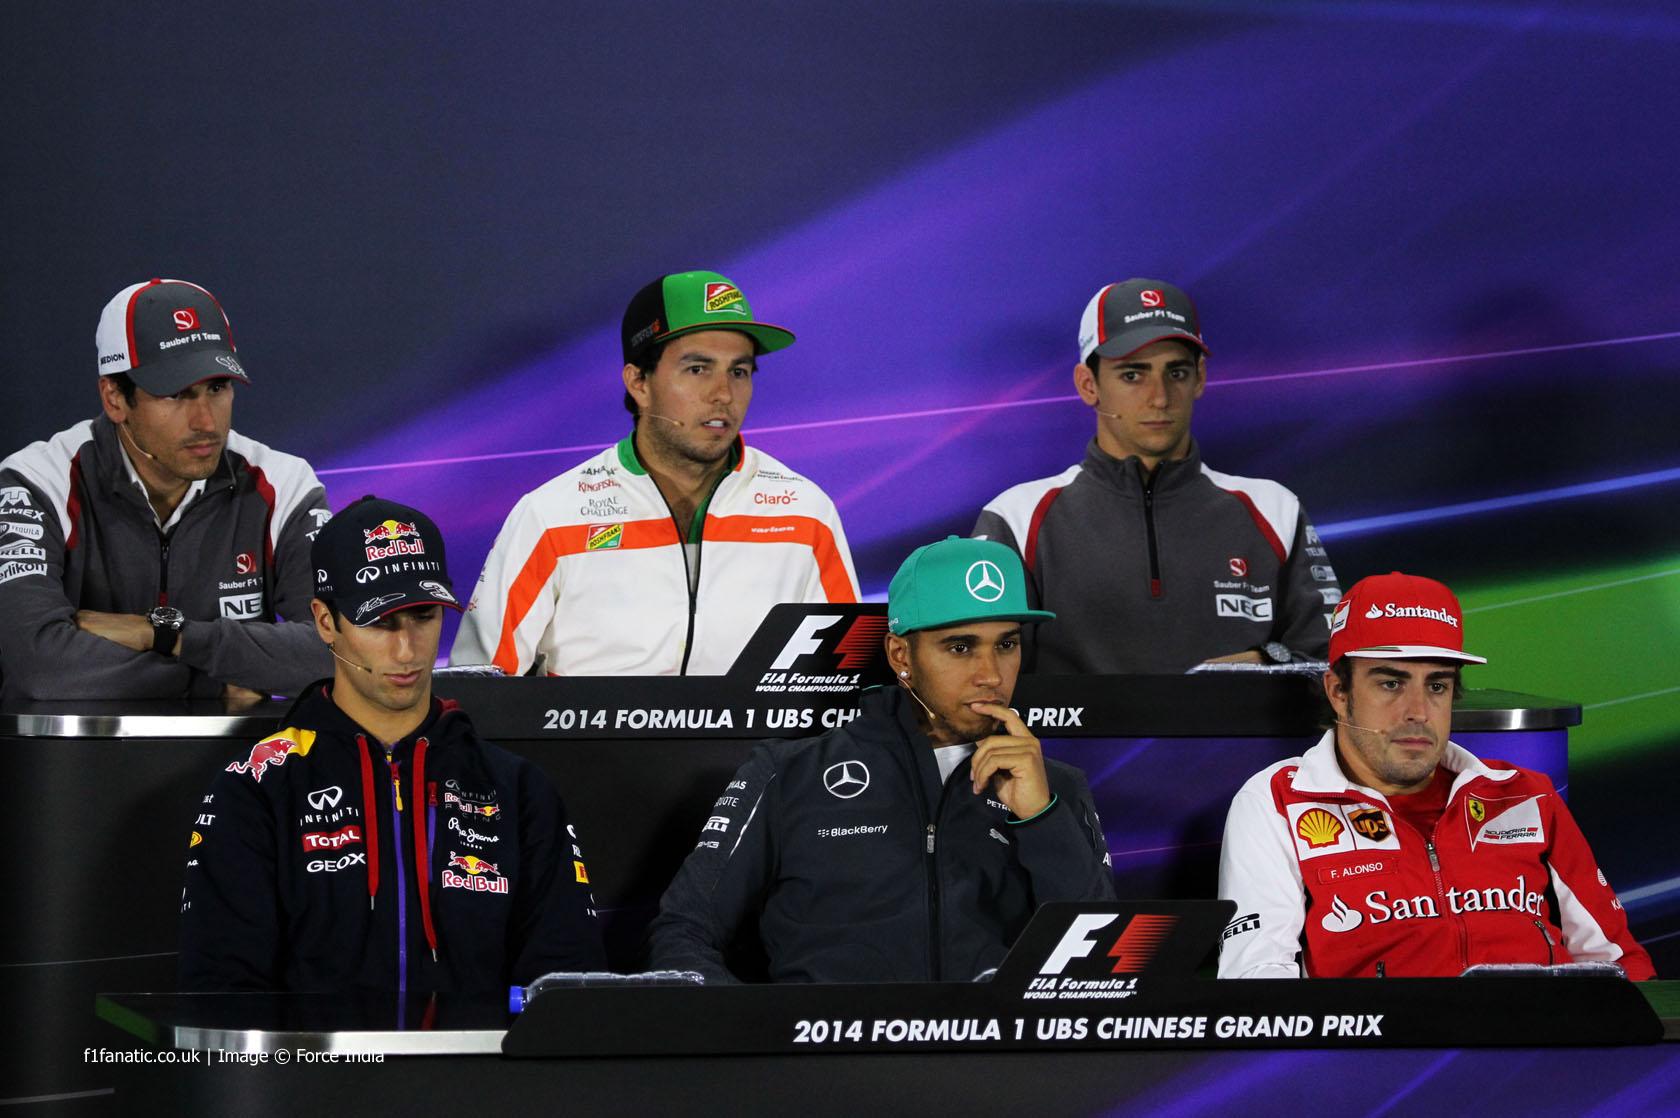 Adrian Sutil, Sergio Perez, Esteban Gutierrez, Daniel Ricciardo, Lewis Hamilton, Fernando Alonso, Shanghai International Circuit, 2014